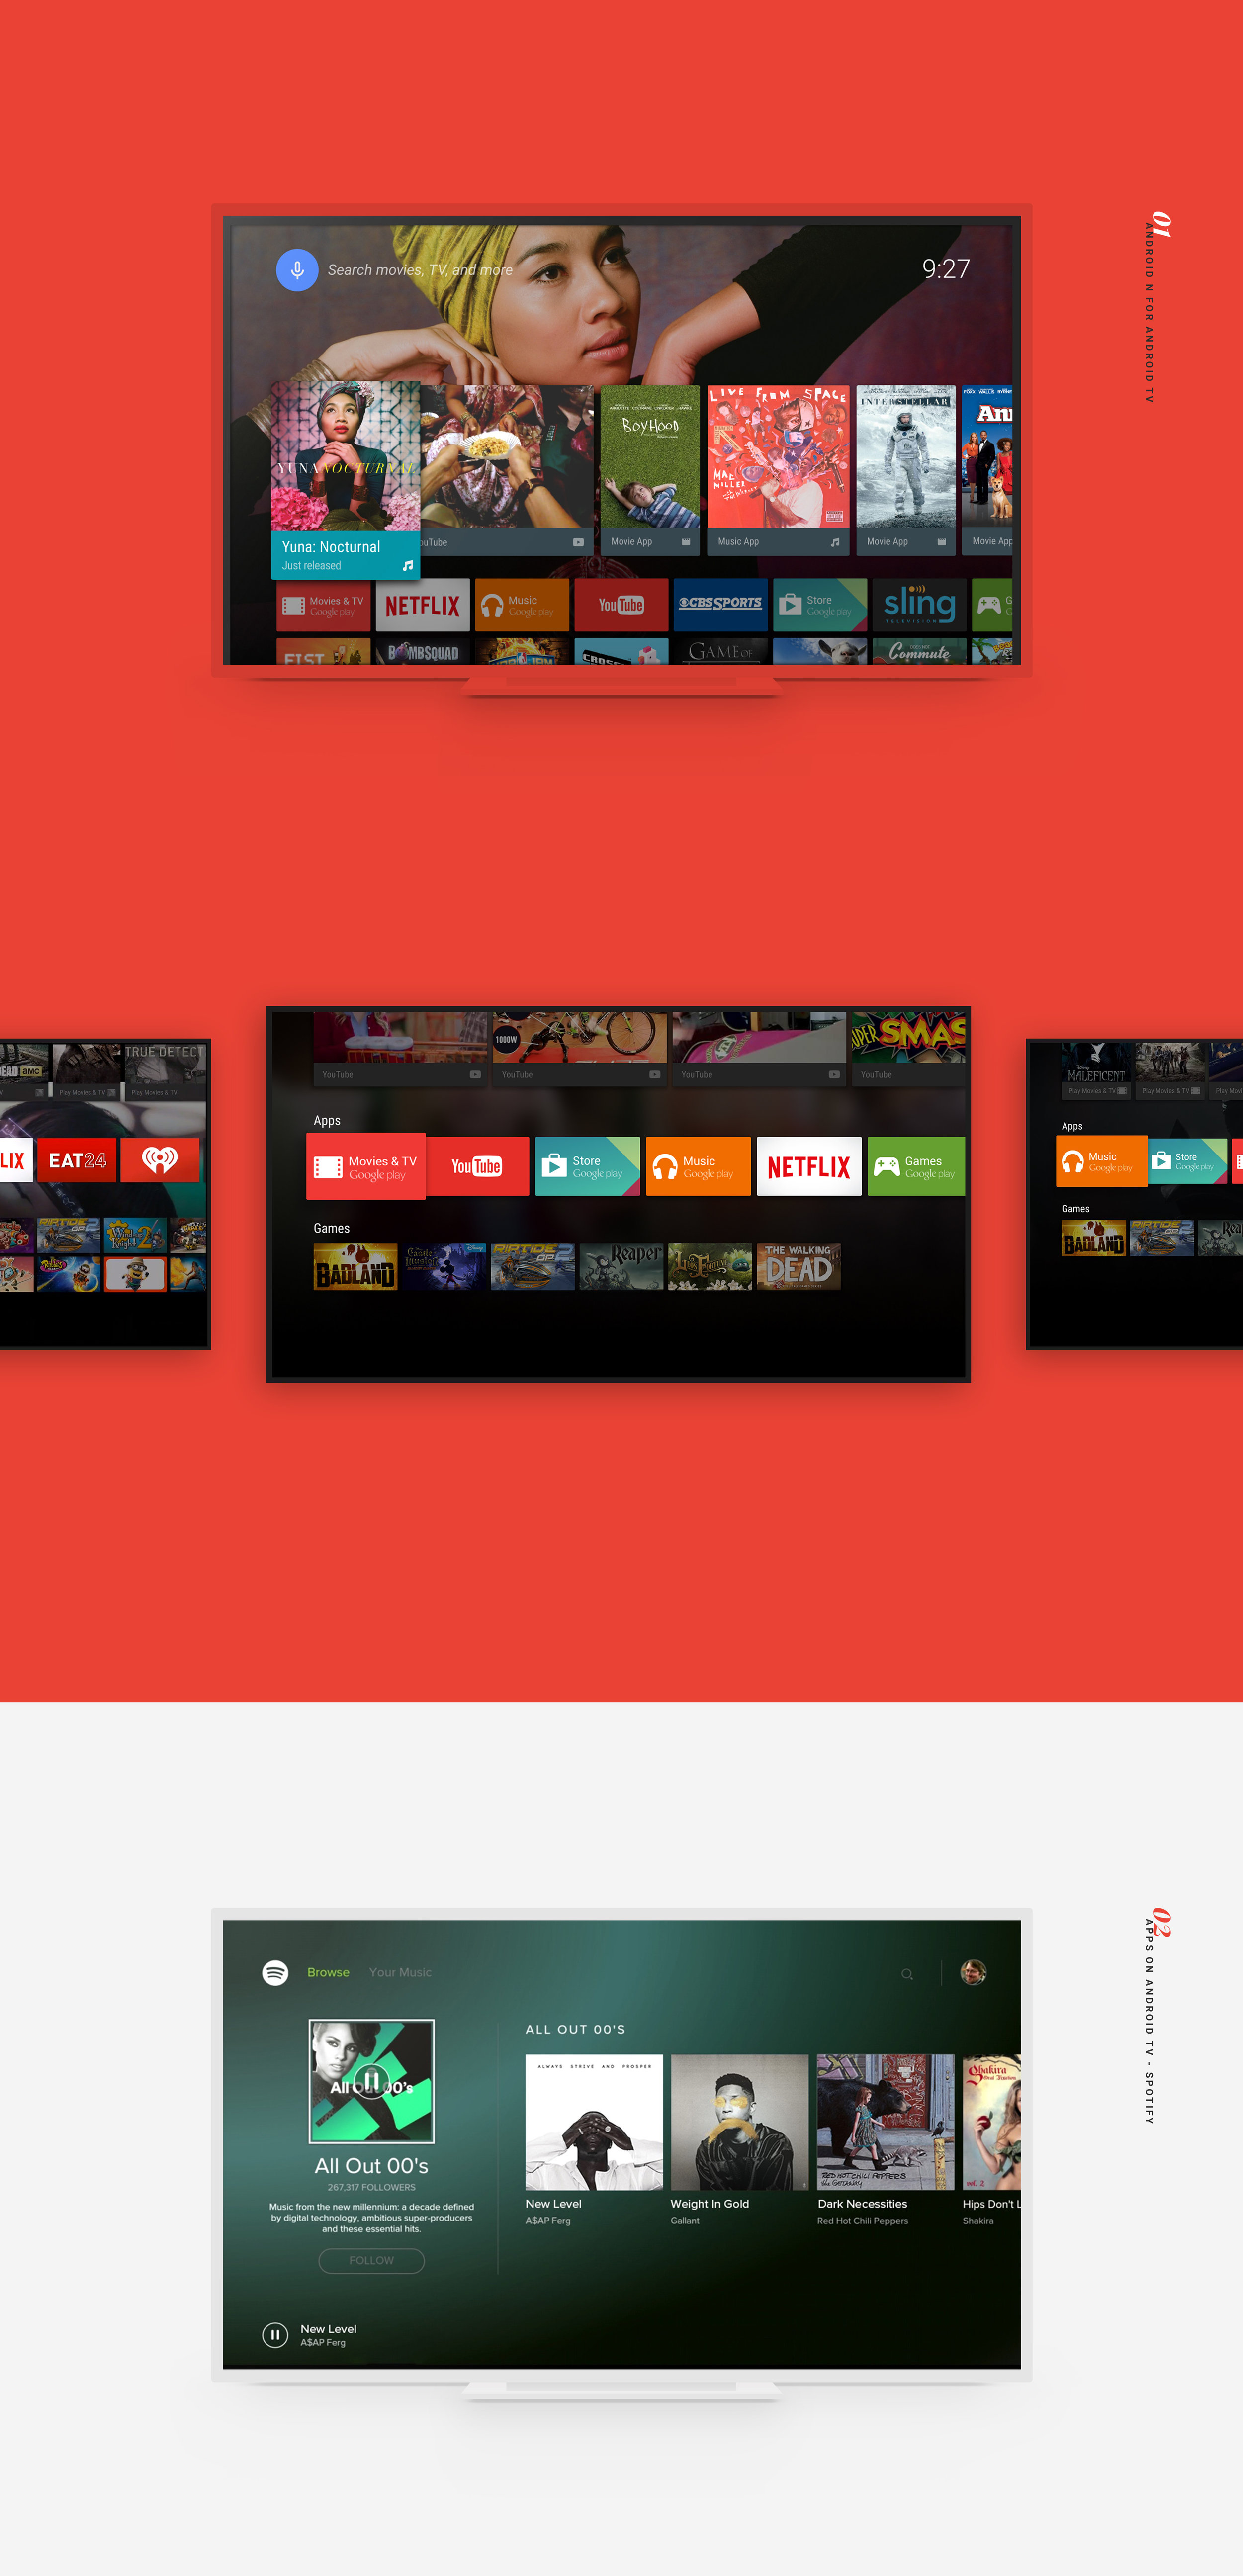 01_TV_ScreenColor.jpg